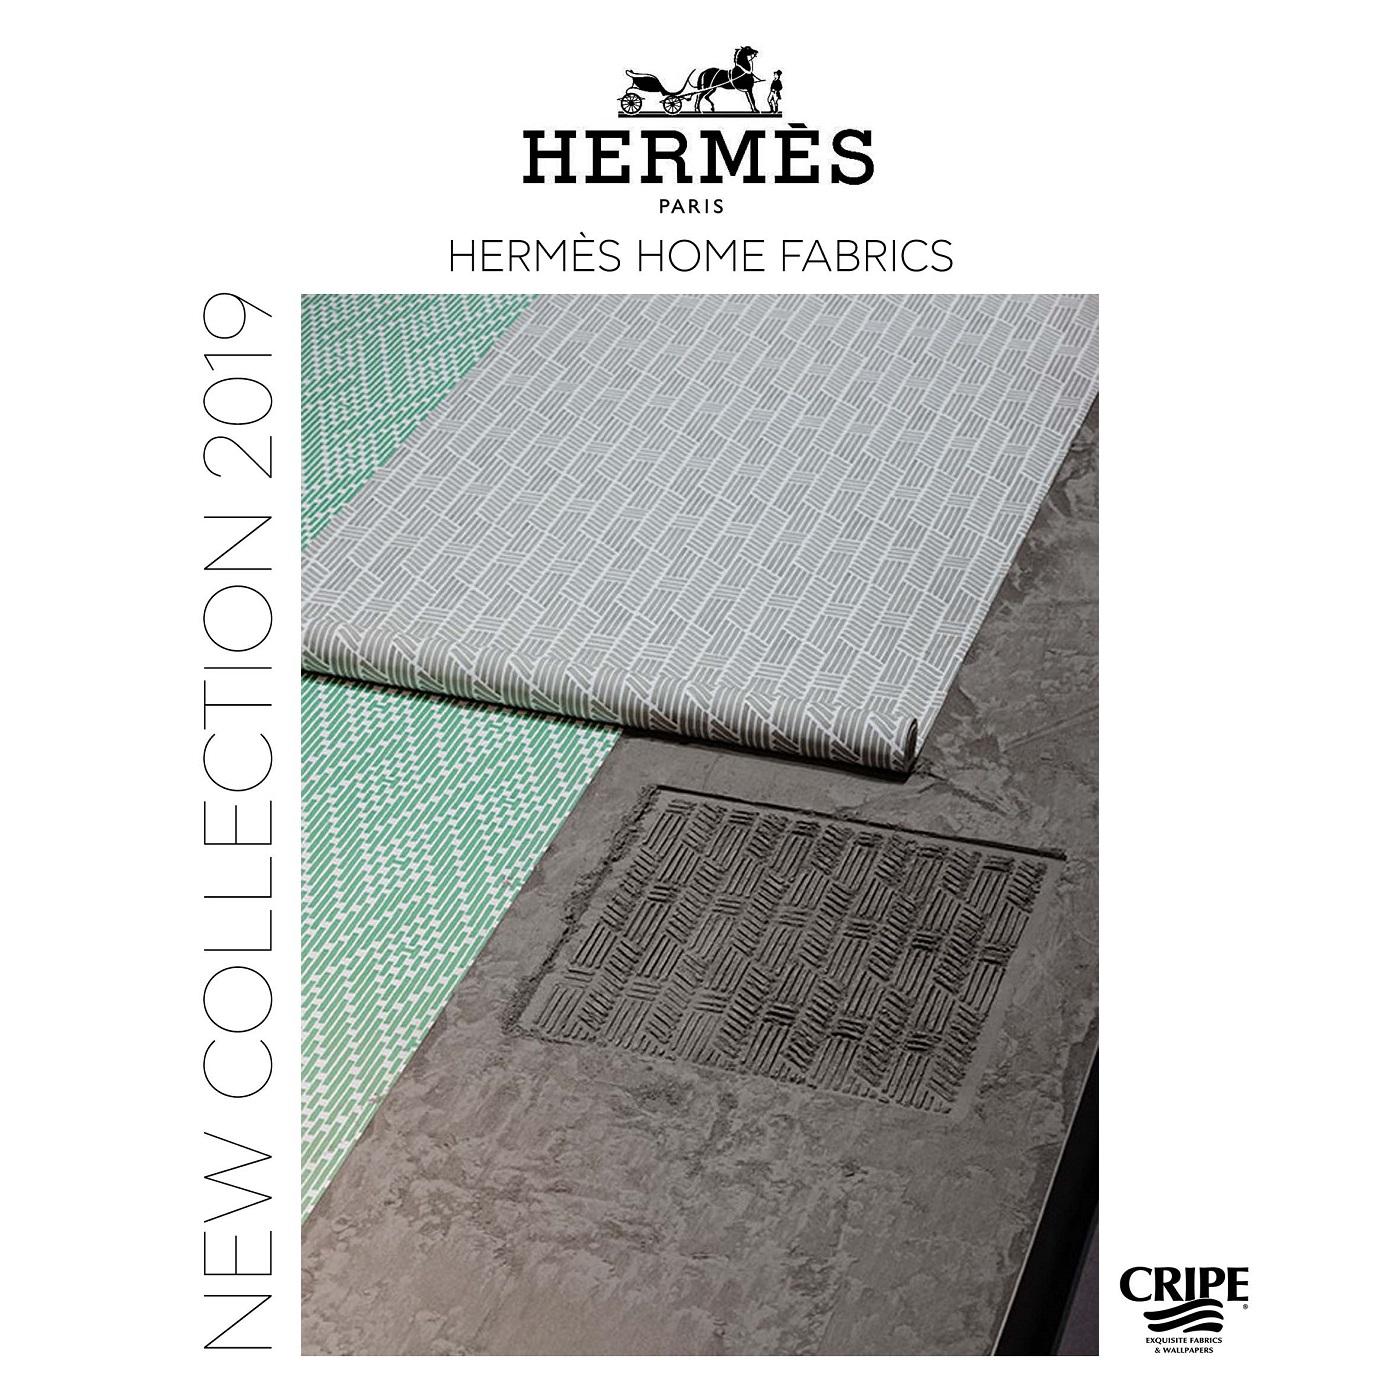 HERMES-2019-CRIPE-PRESENTATION 25